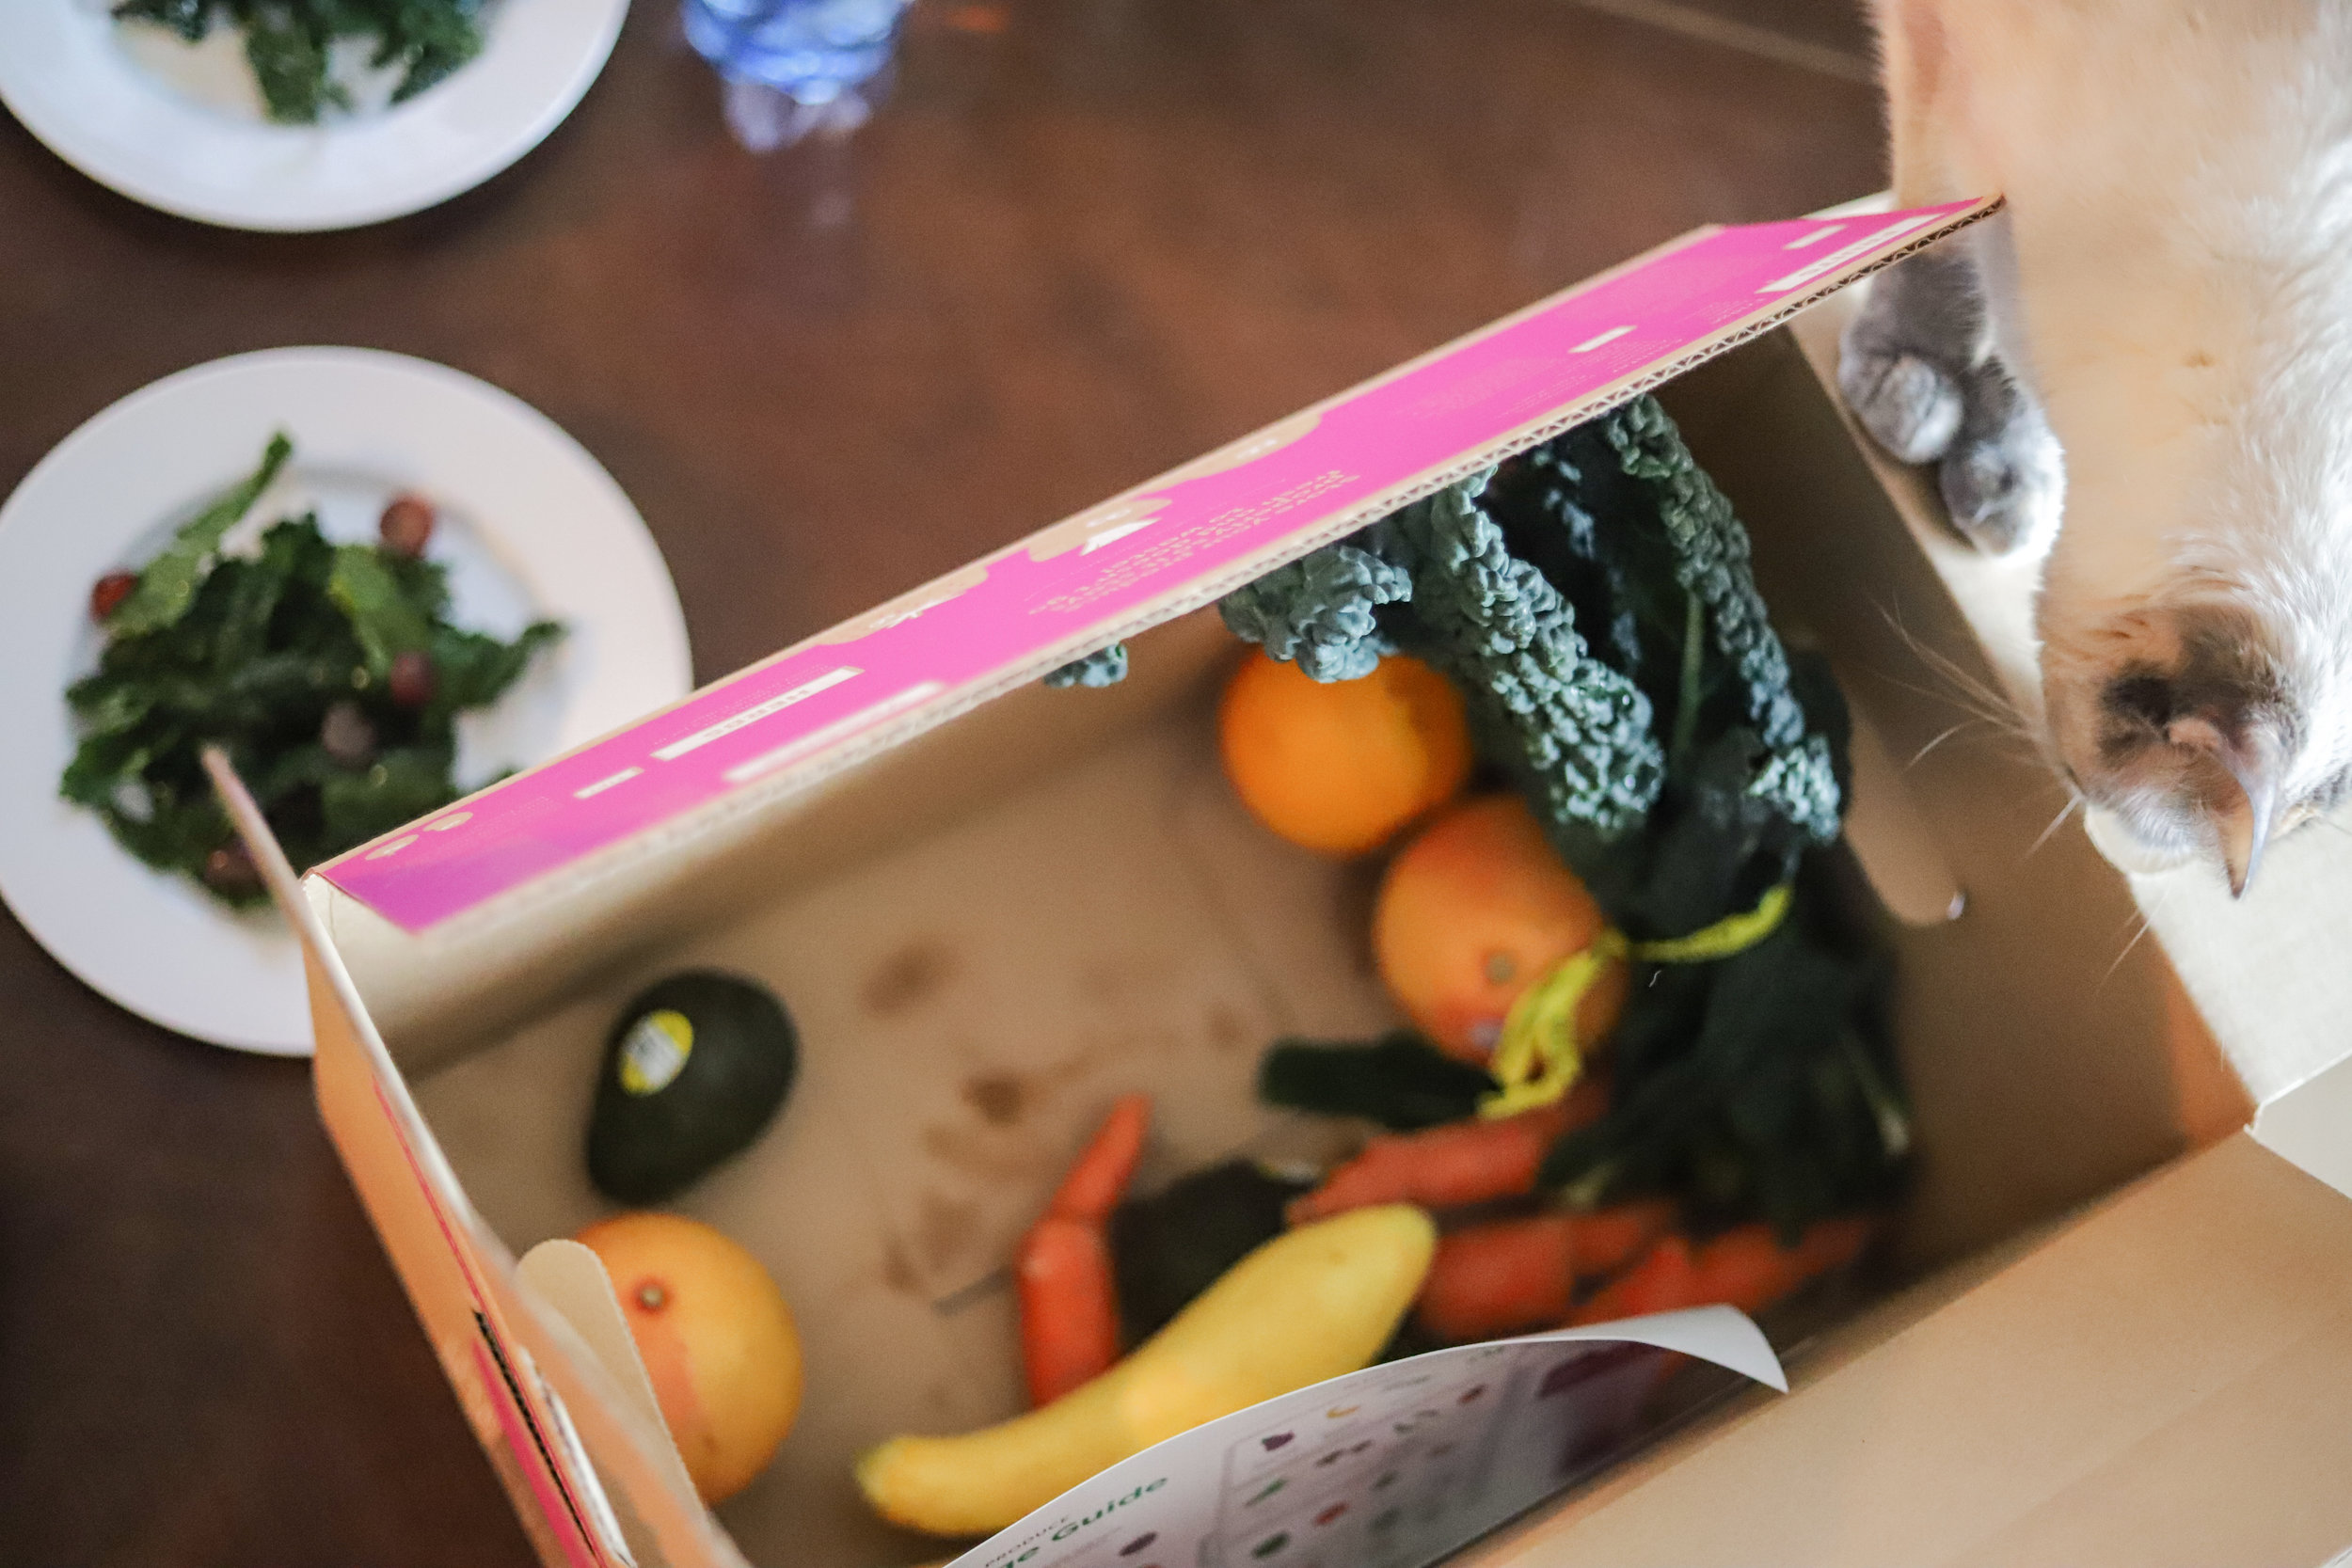 organic produce for less, imperfect produce, fruits and veggies delivered to your door,  vegetables, dallas, houston, austin, san antonio,  sacramento, la, san diego, la, san francisco